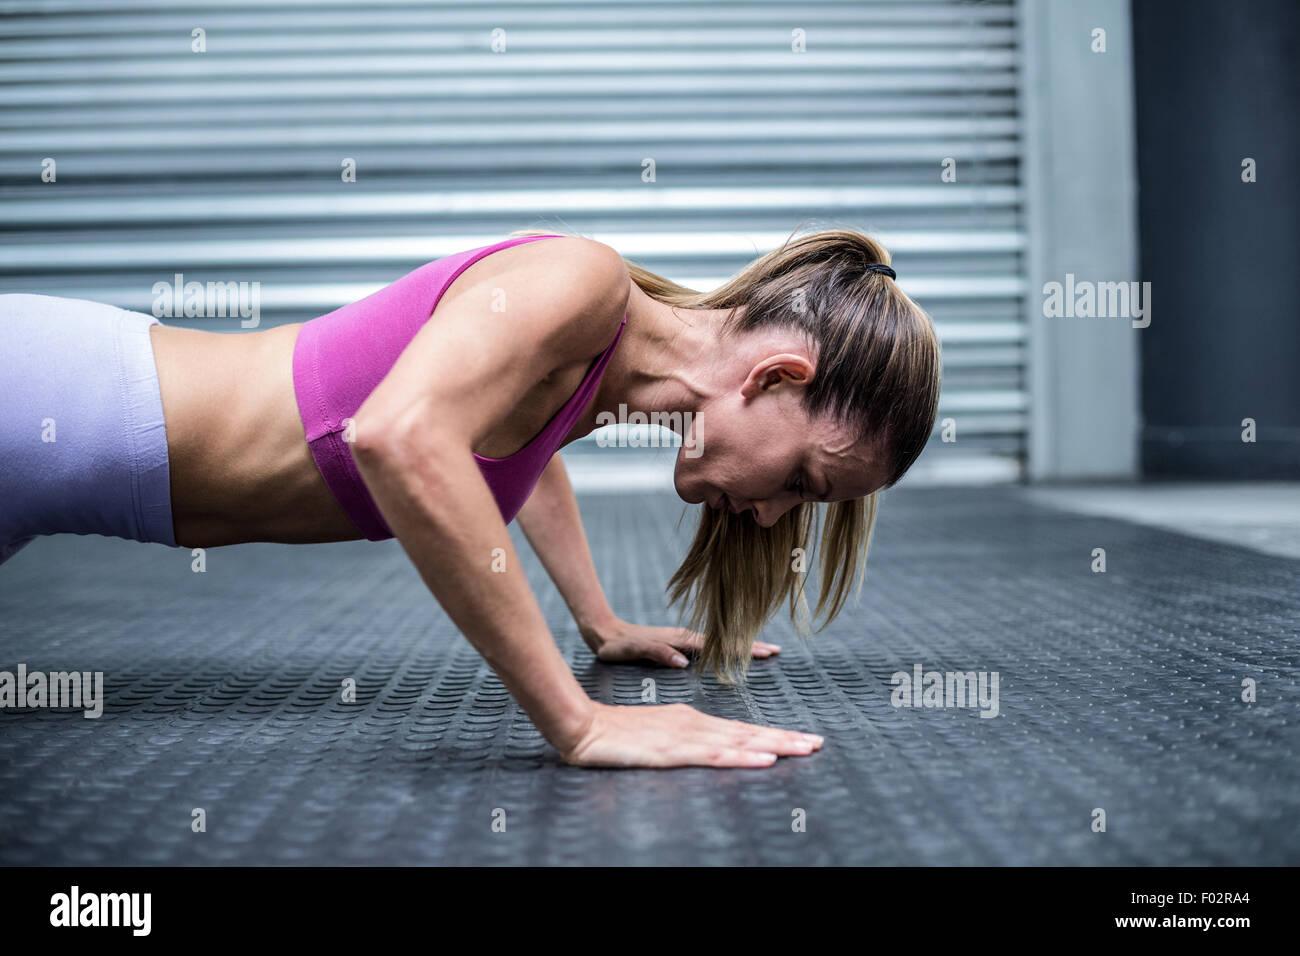 Muscular woman doing push ups - Stock Image